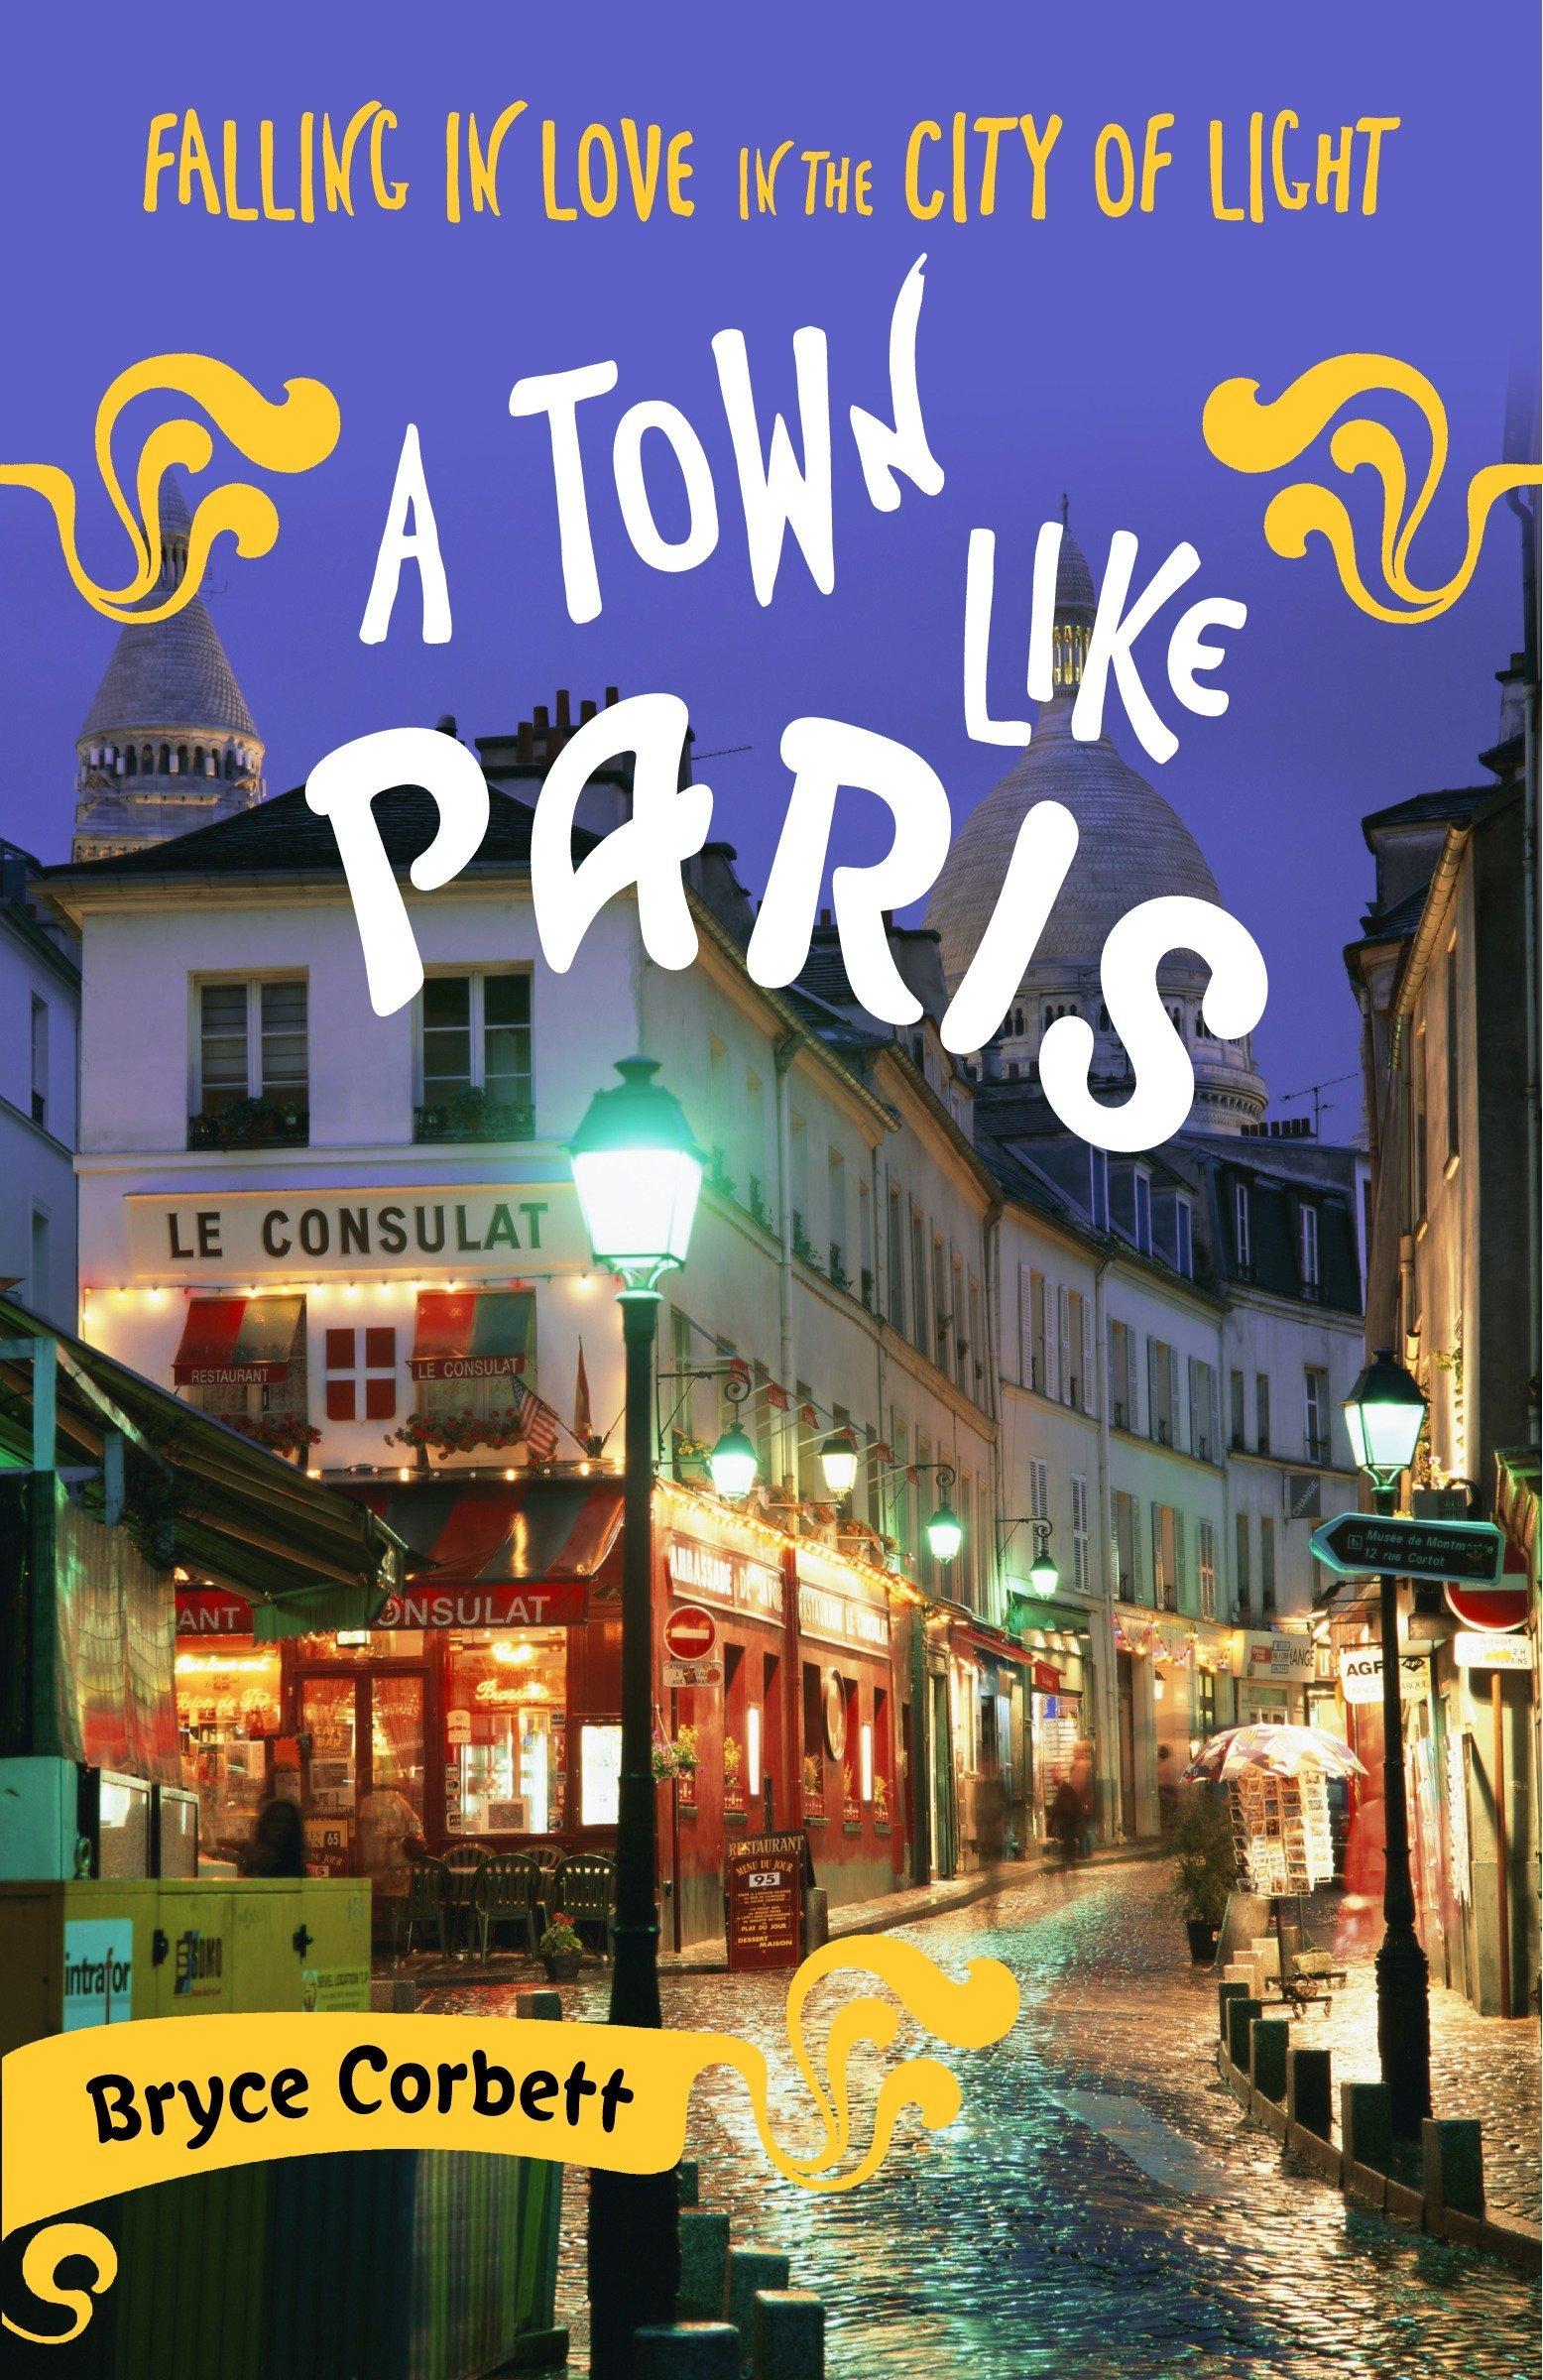 Le Jardin De Marie Élégant A town Like Paris Falling In Love In the City Of Light